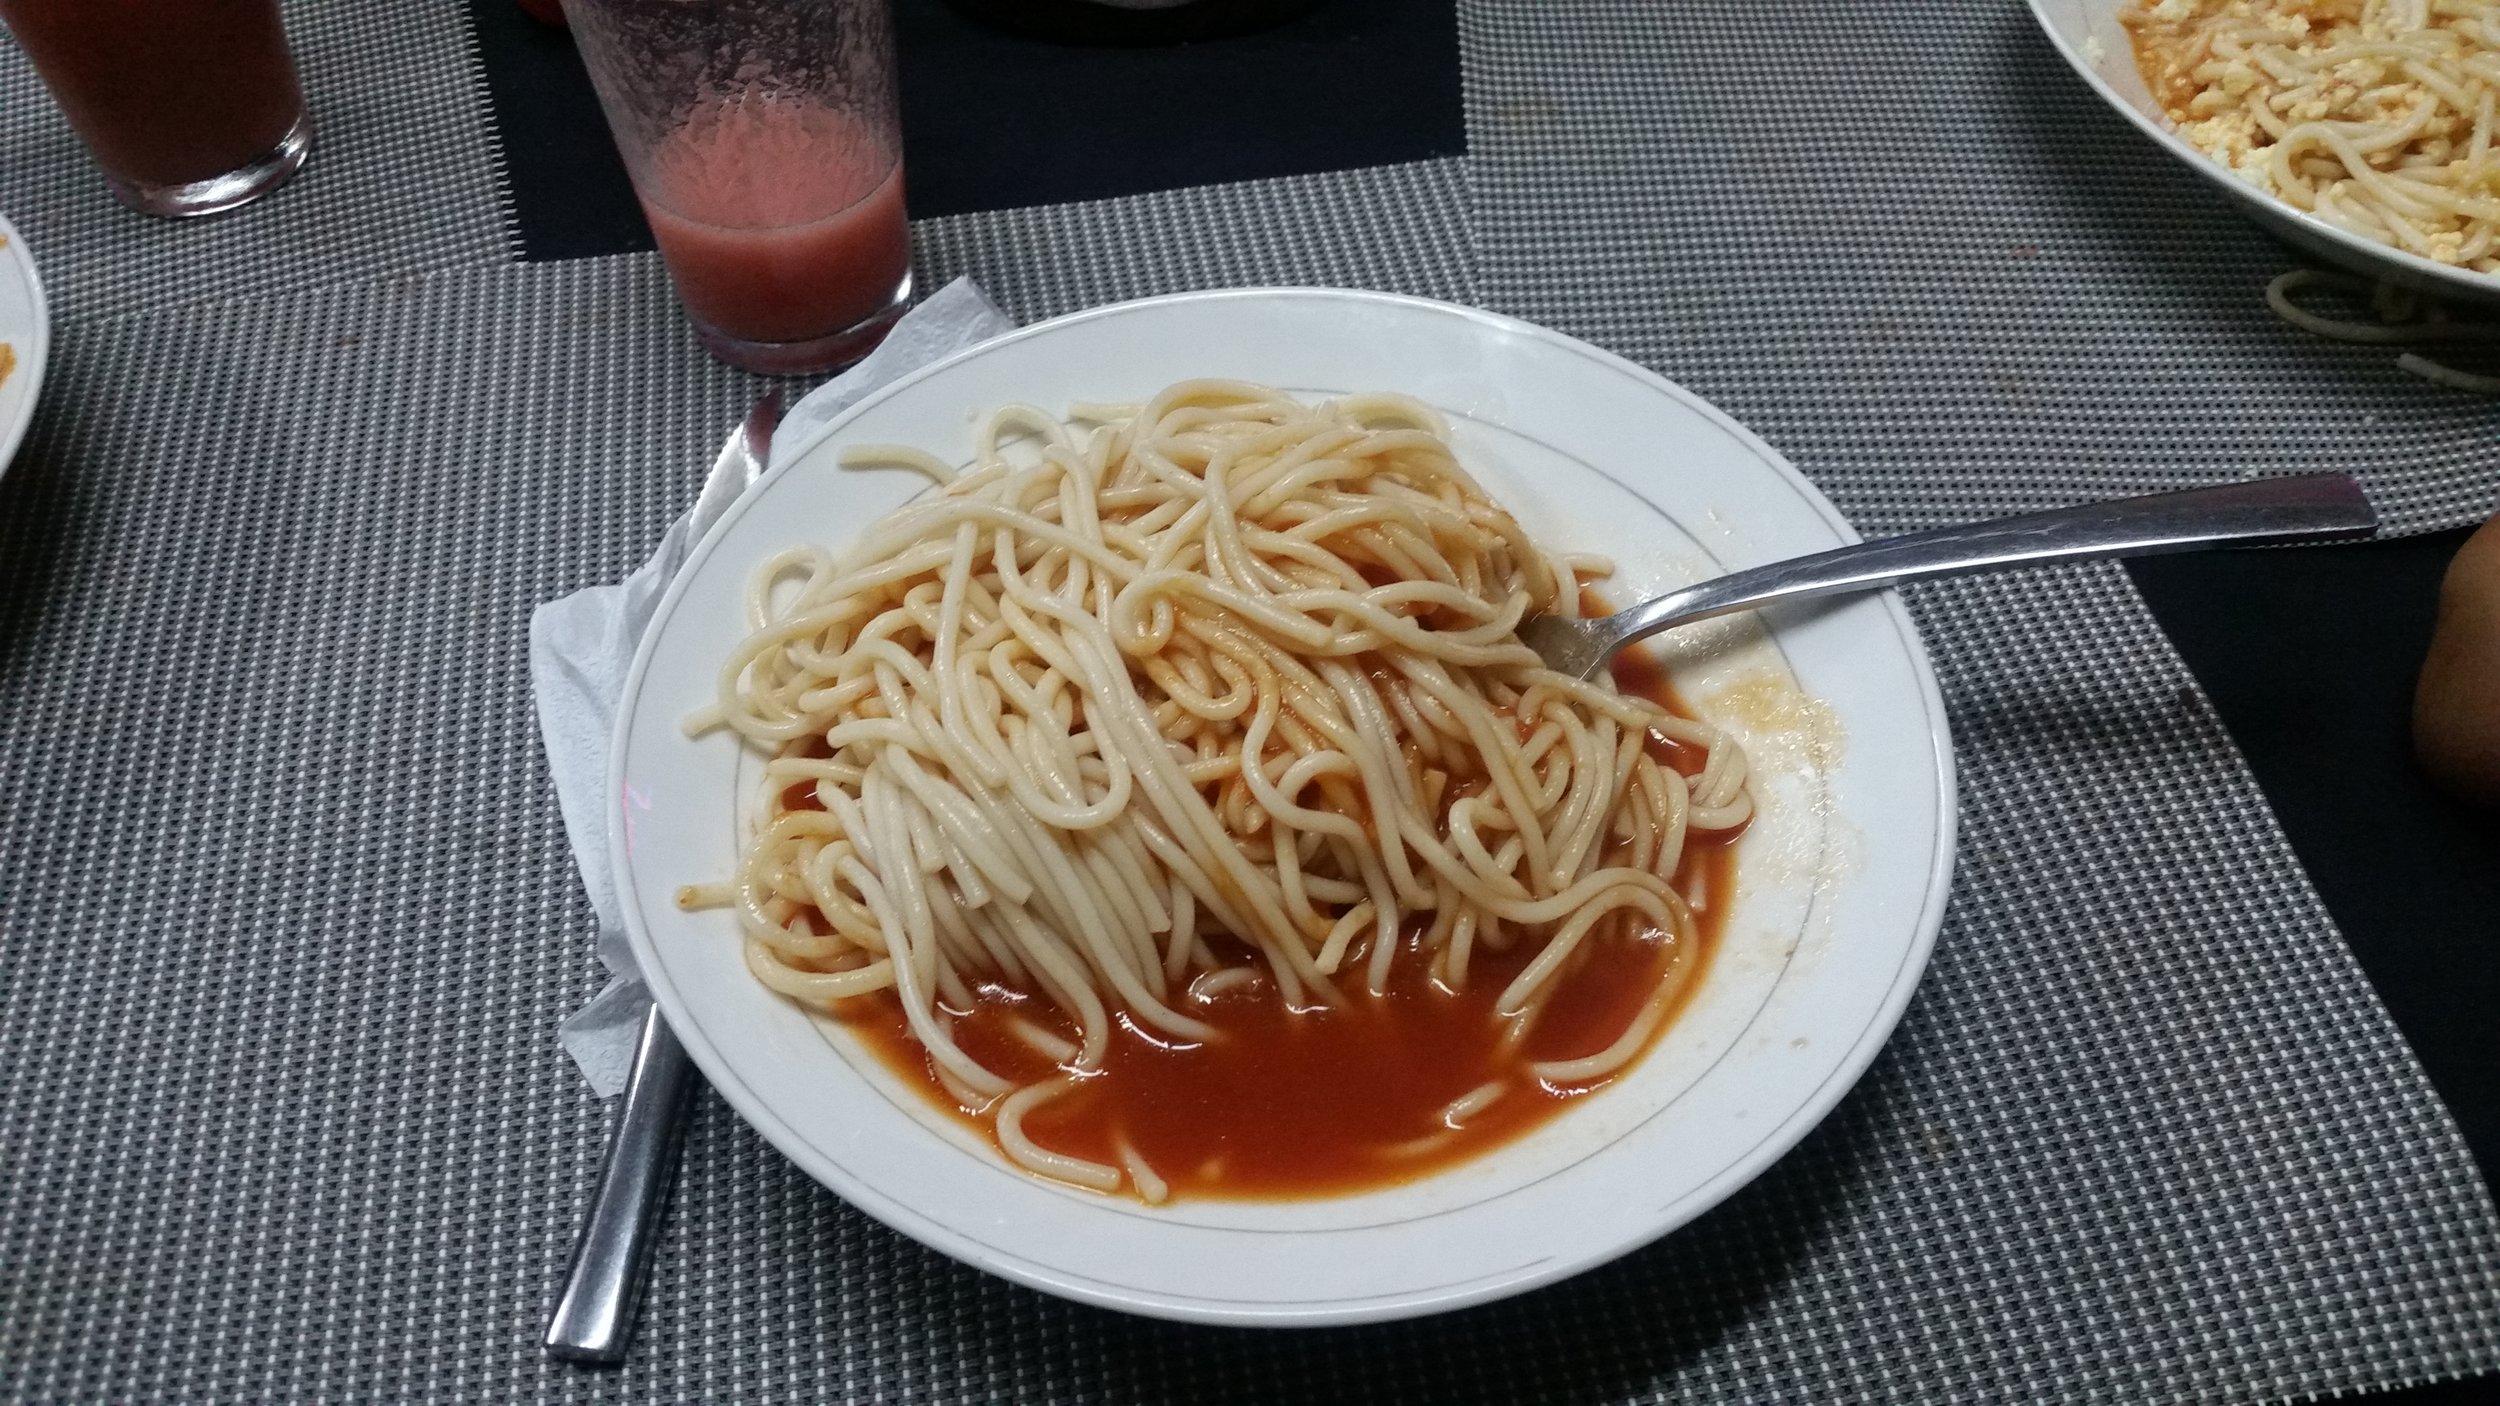 Typical spaghetti (no mustard)